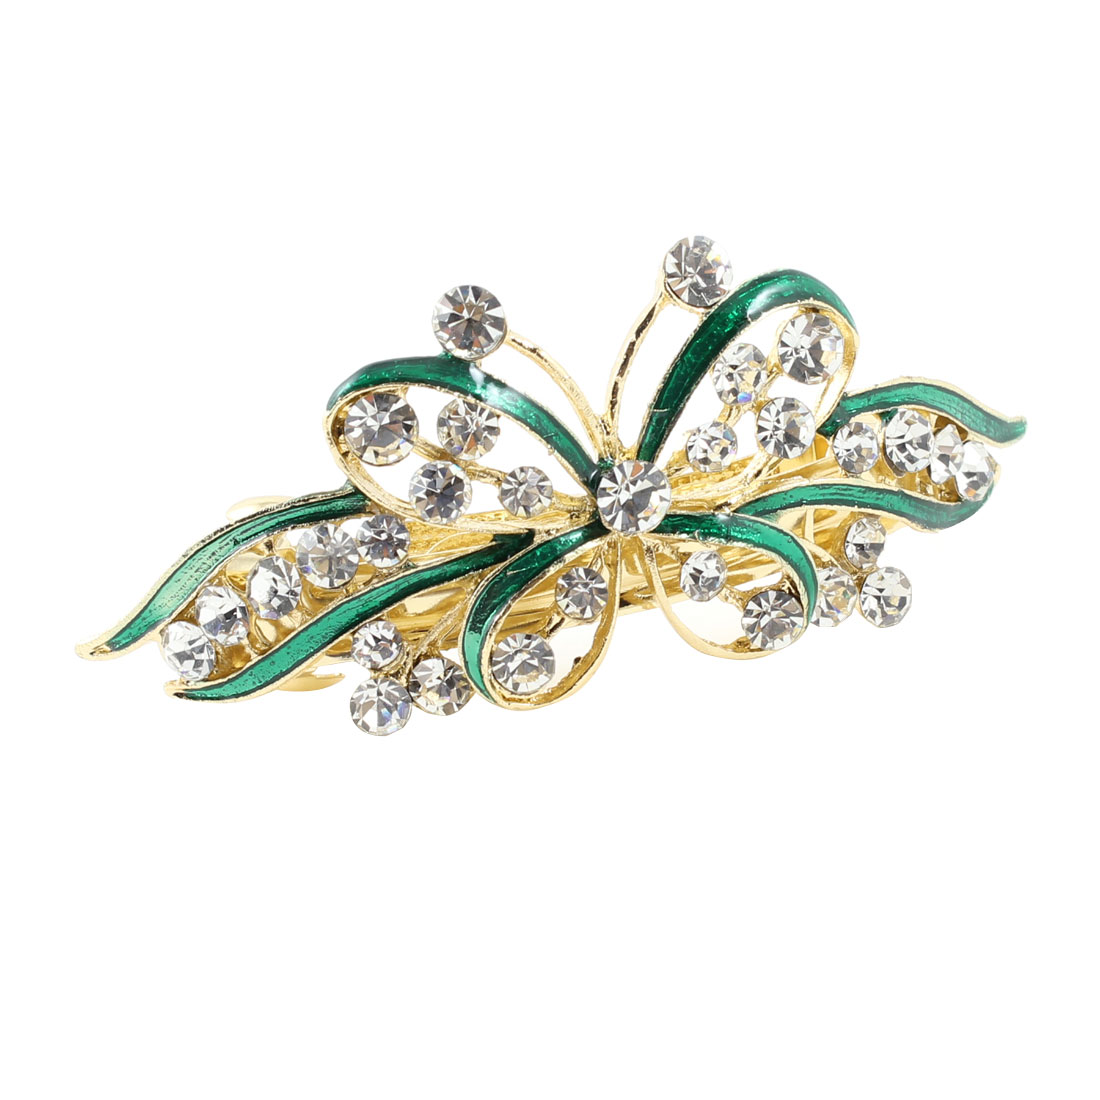 Gold Tone Green Butterfly Detail Bling Rhinestone Hair Barrette Clip